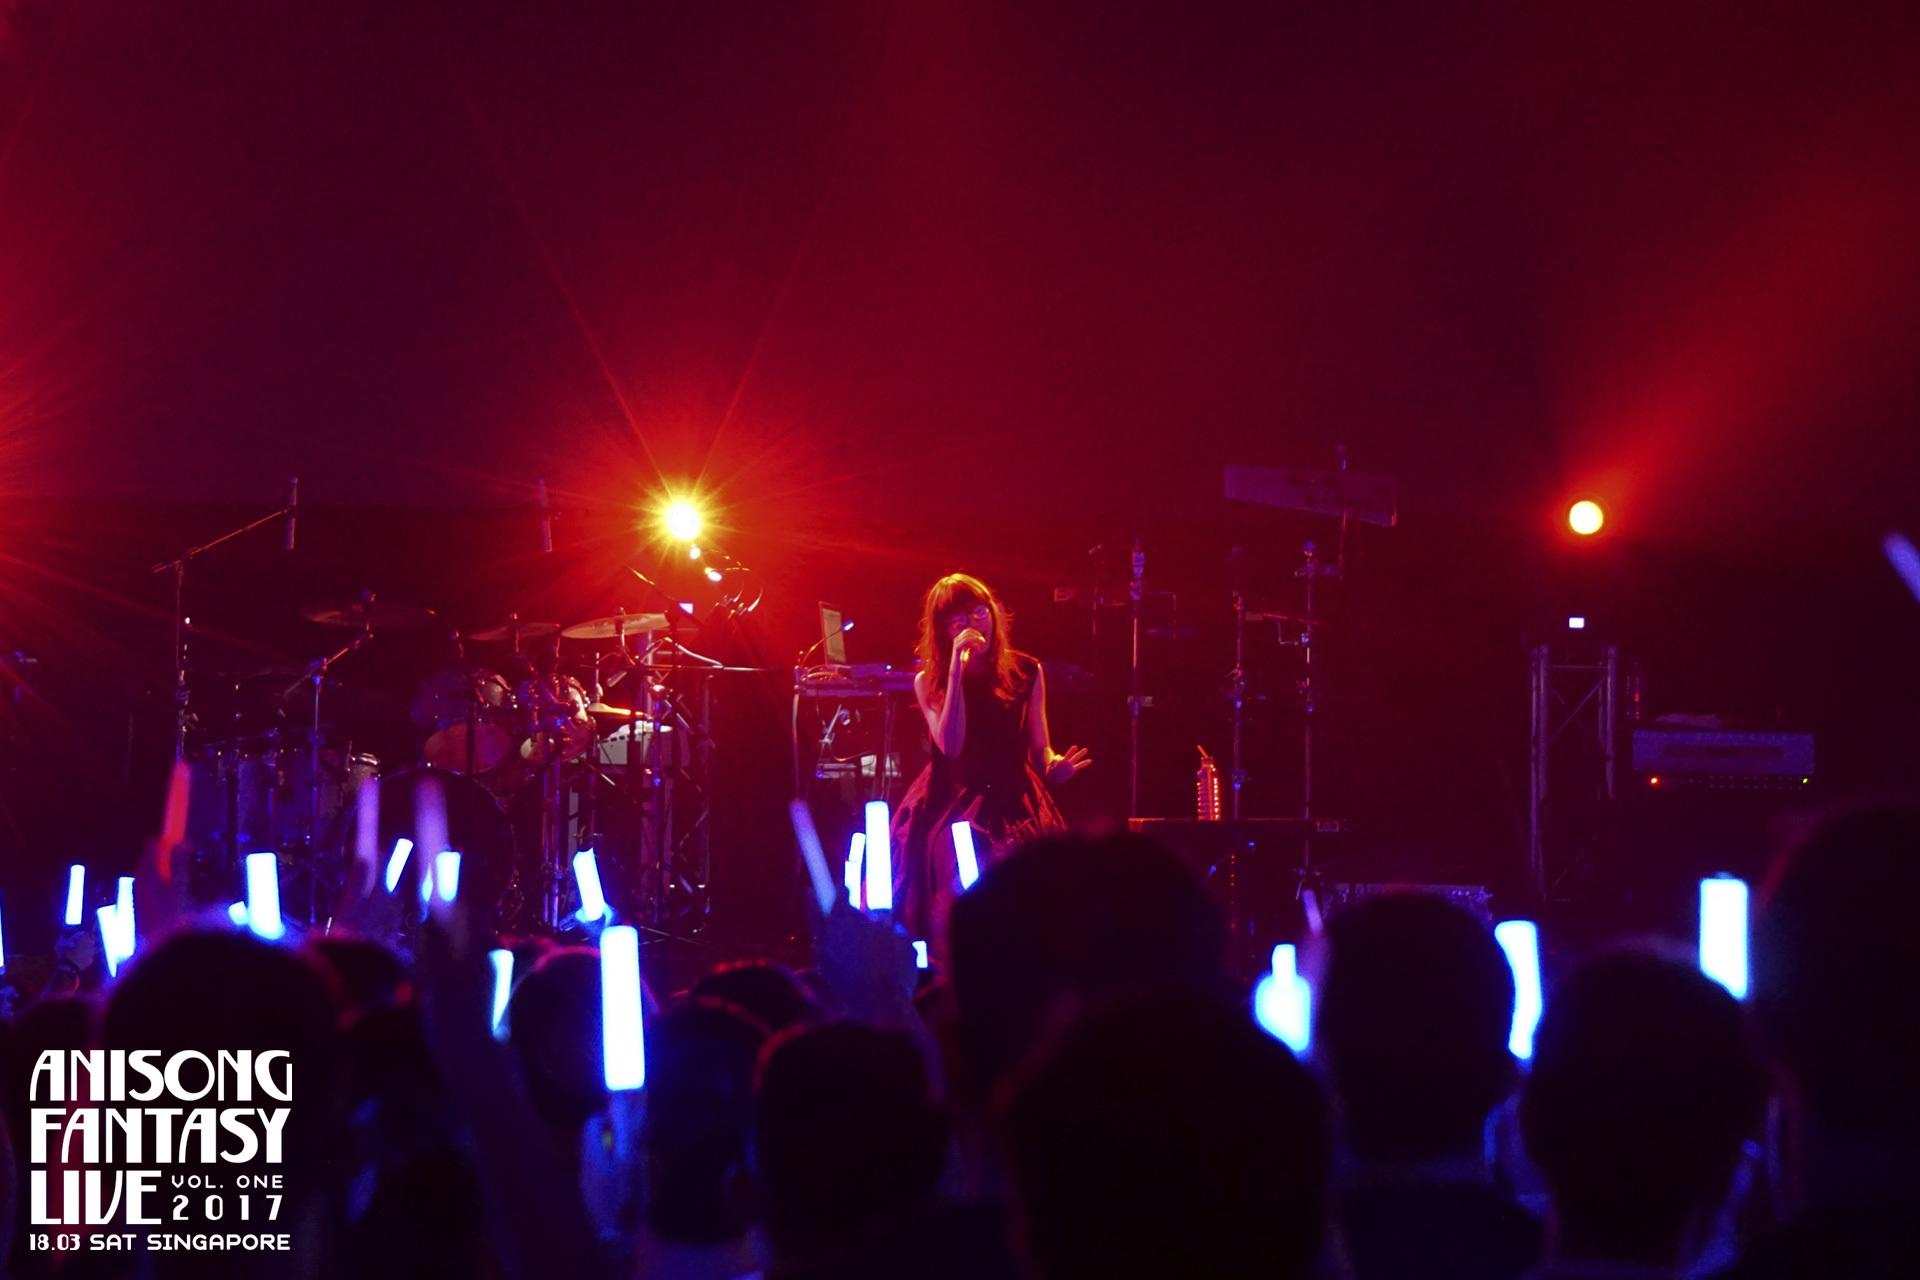 aimer anisong fantasy live 2017 singapore